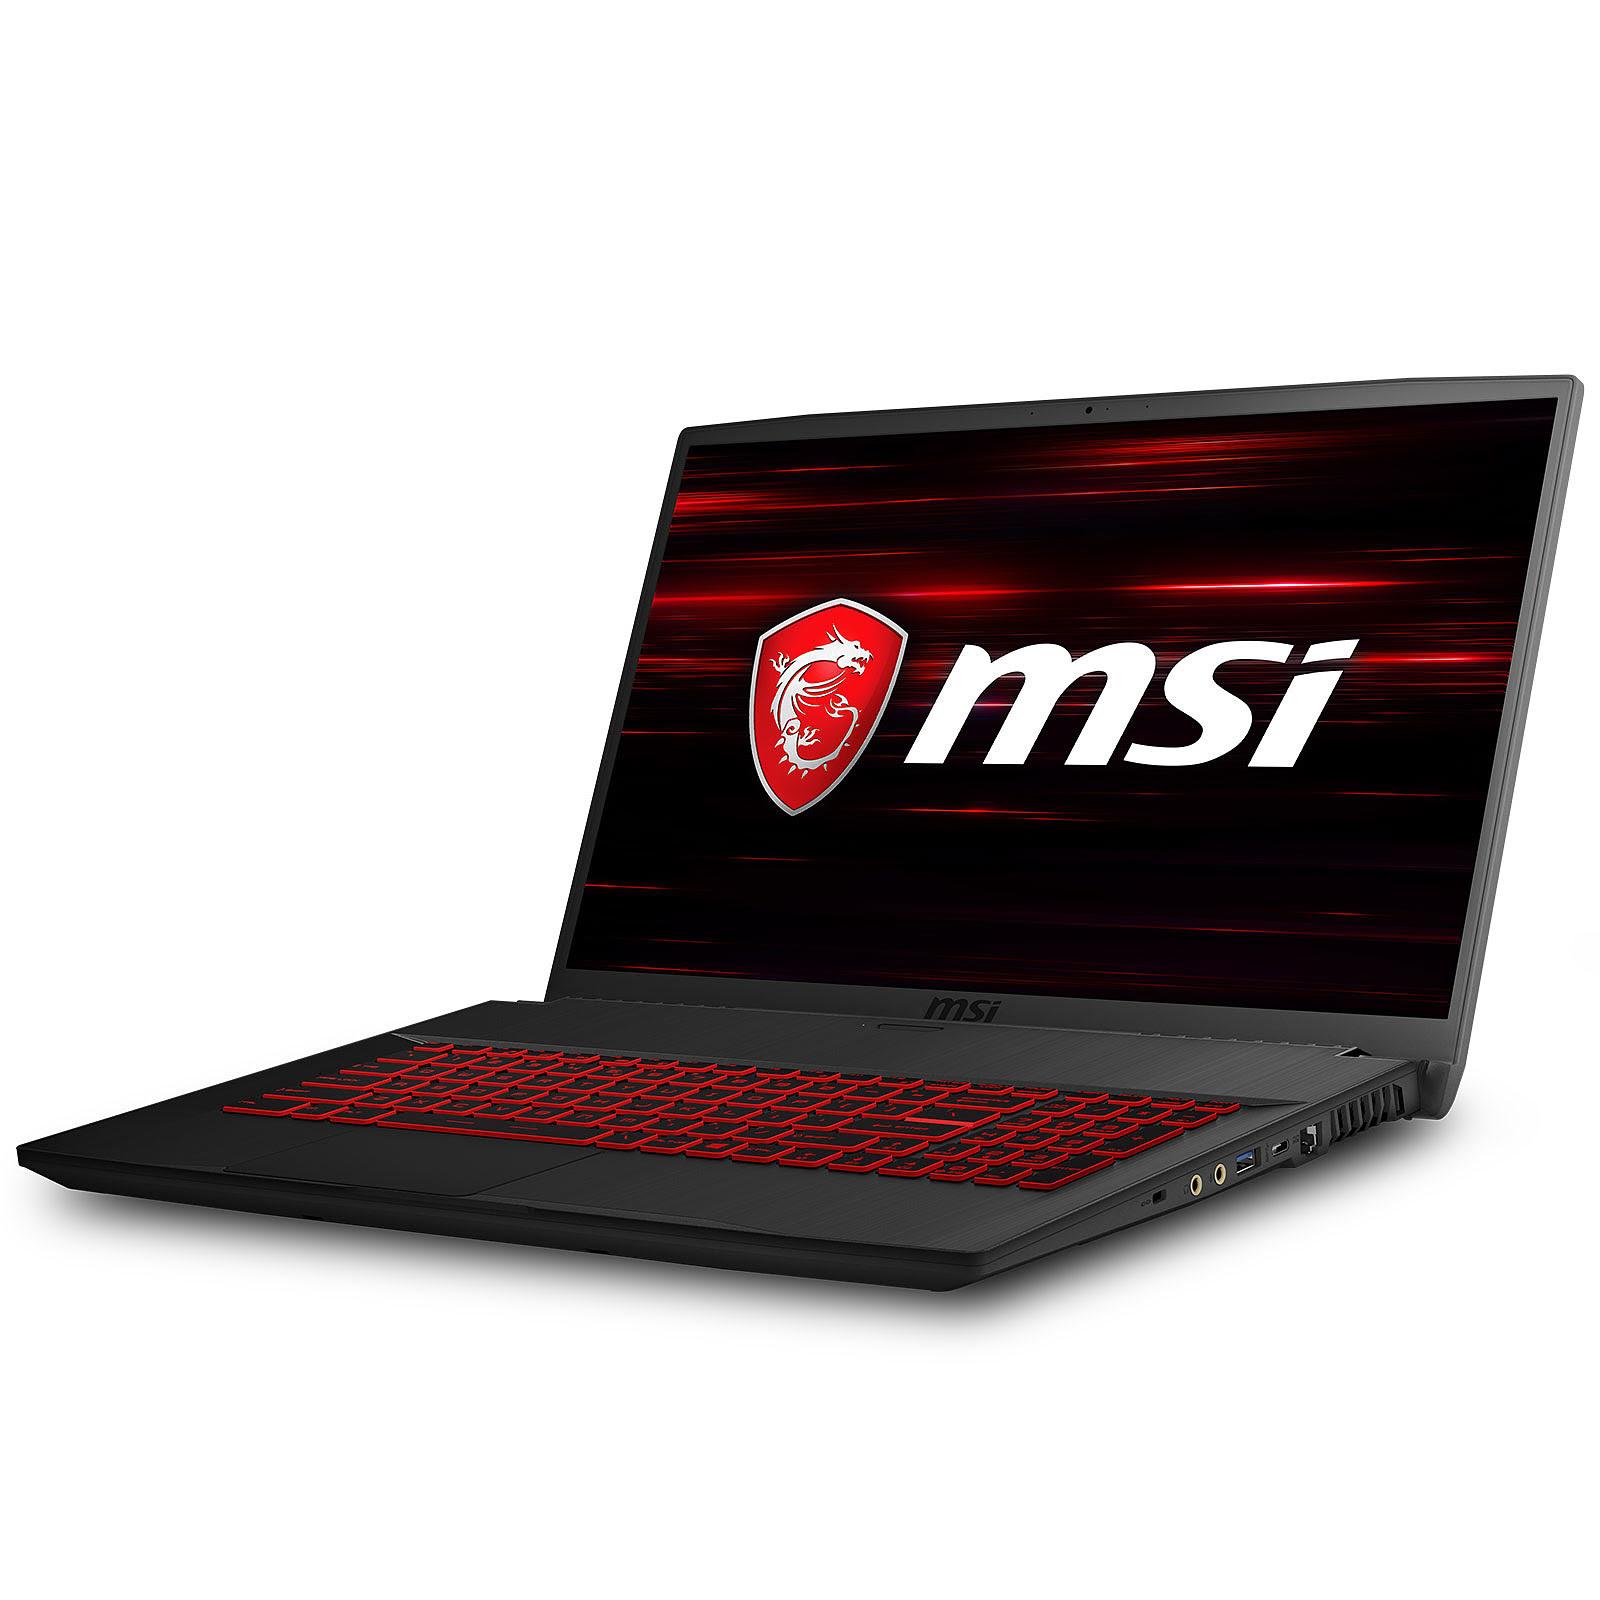 MSI 9S7-17F112-050 - PC portable MSI - Cybertek.fr - 4